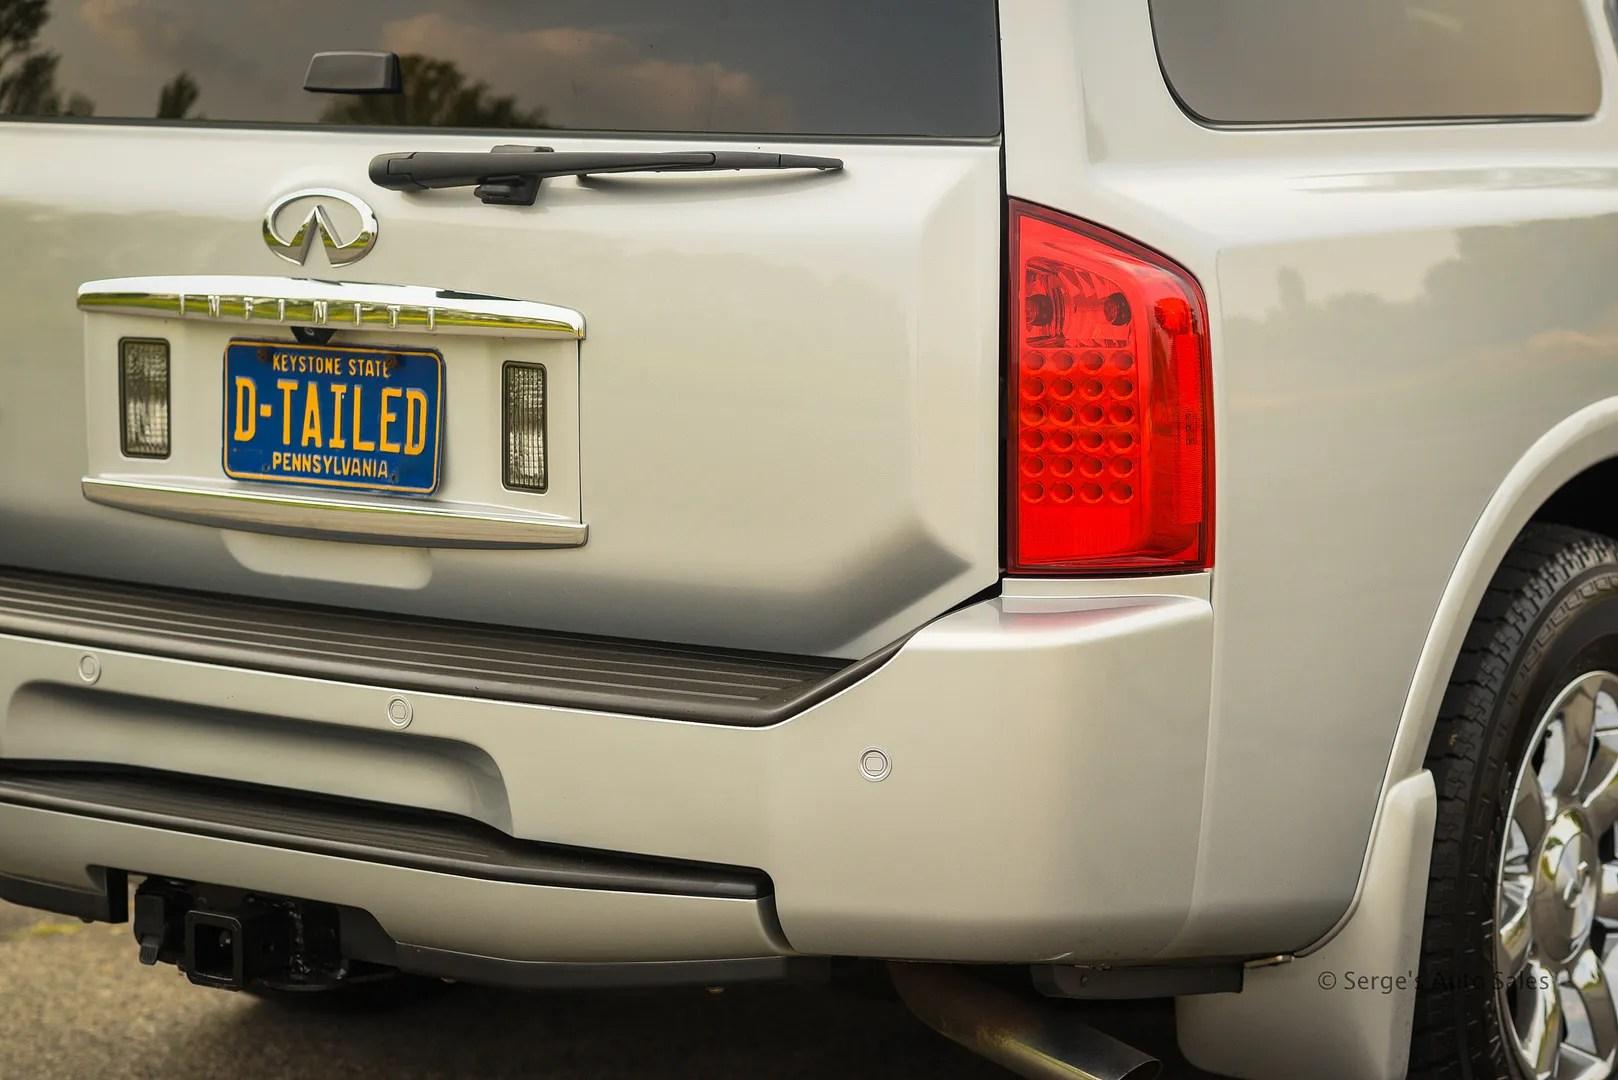 photo Infiniti-Serges-Auto-Sales-Car-dealer-Pennsylvania-QX56-Scranton-Nepa-23_zpss8zwirsz.jpg